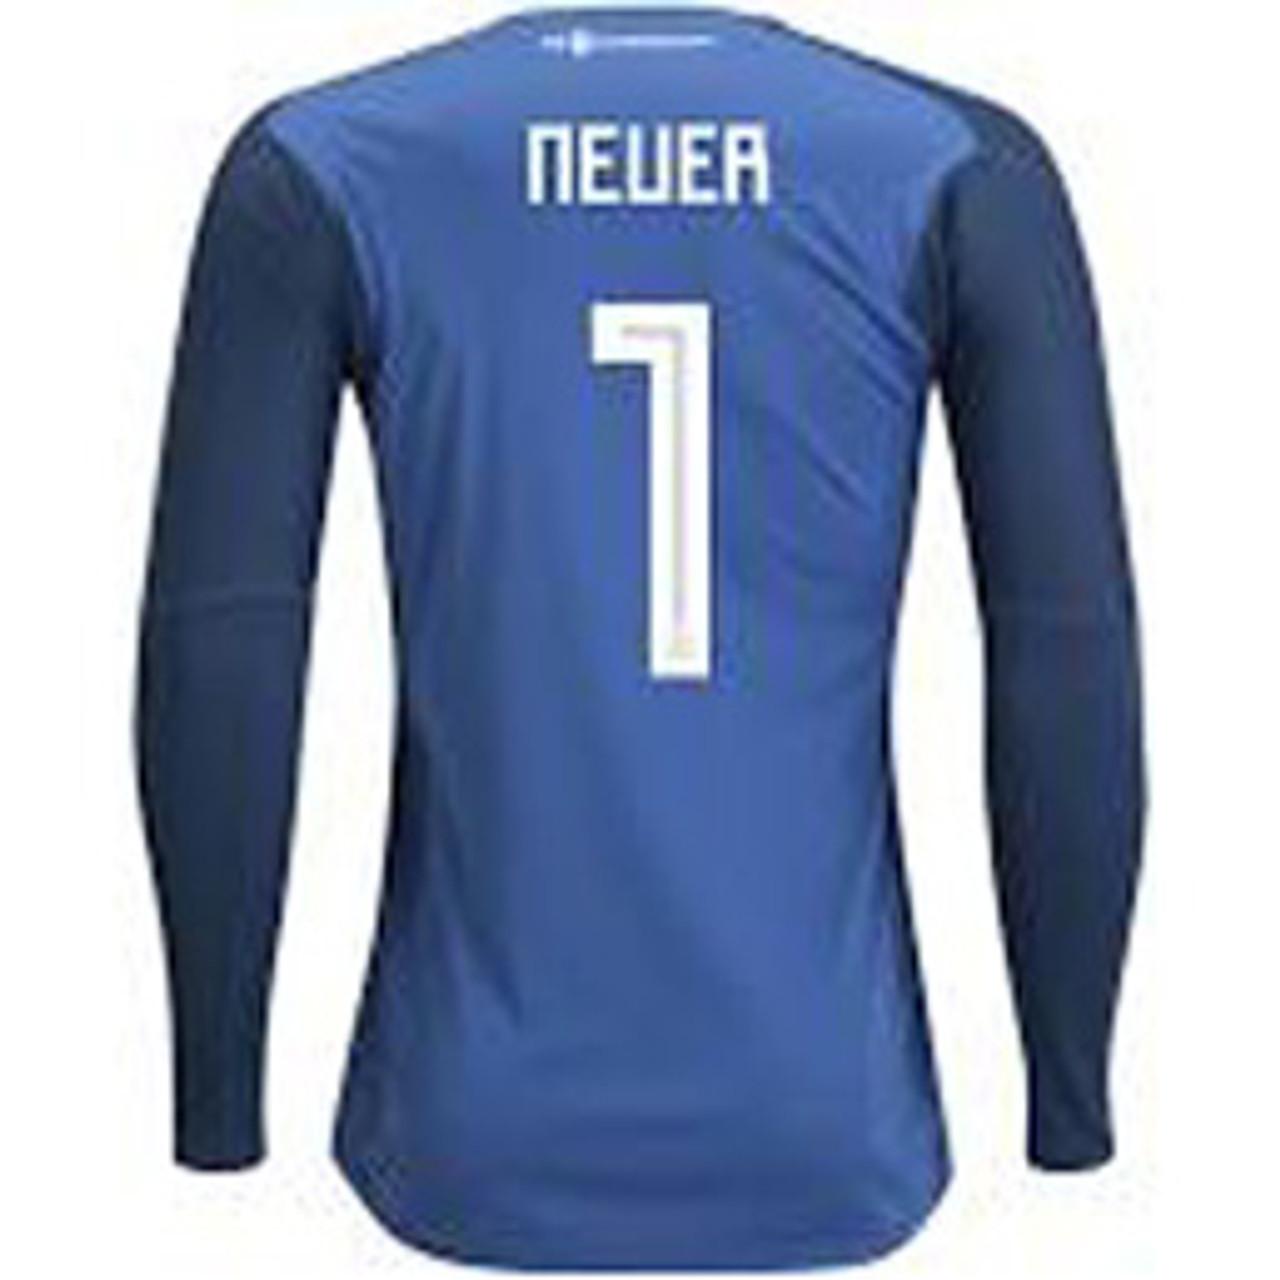 timeless design fa48a 52081 ADIDAS GERMANY 2018 WORLD CUP G/K `NEUER`JERSEY BLUE